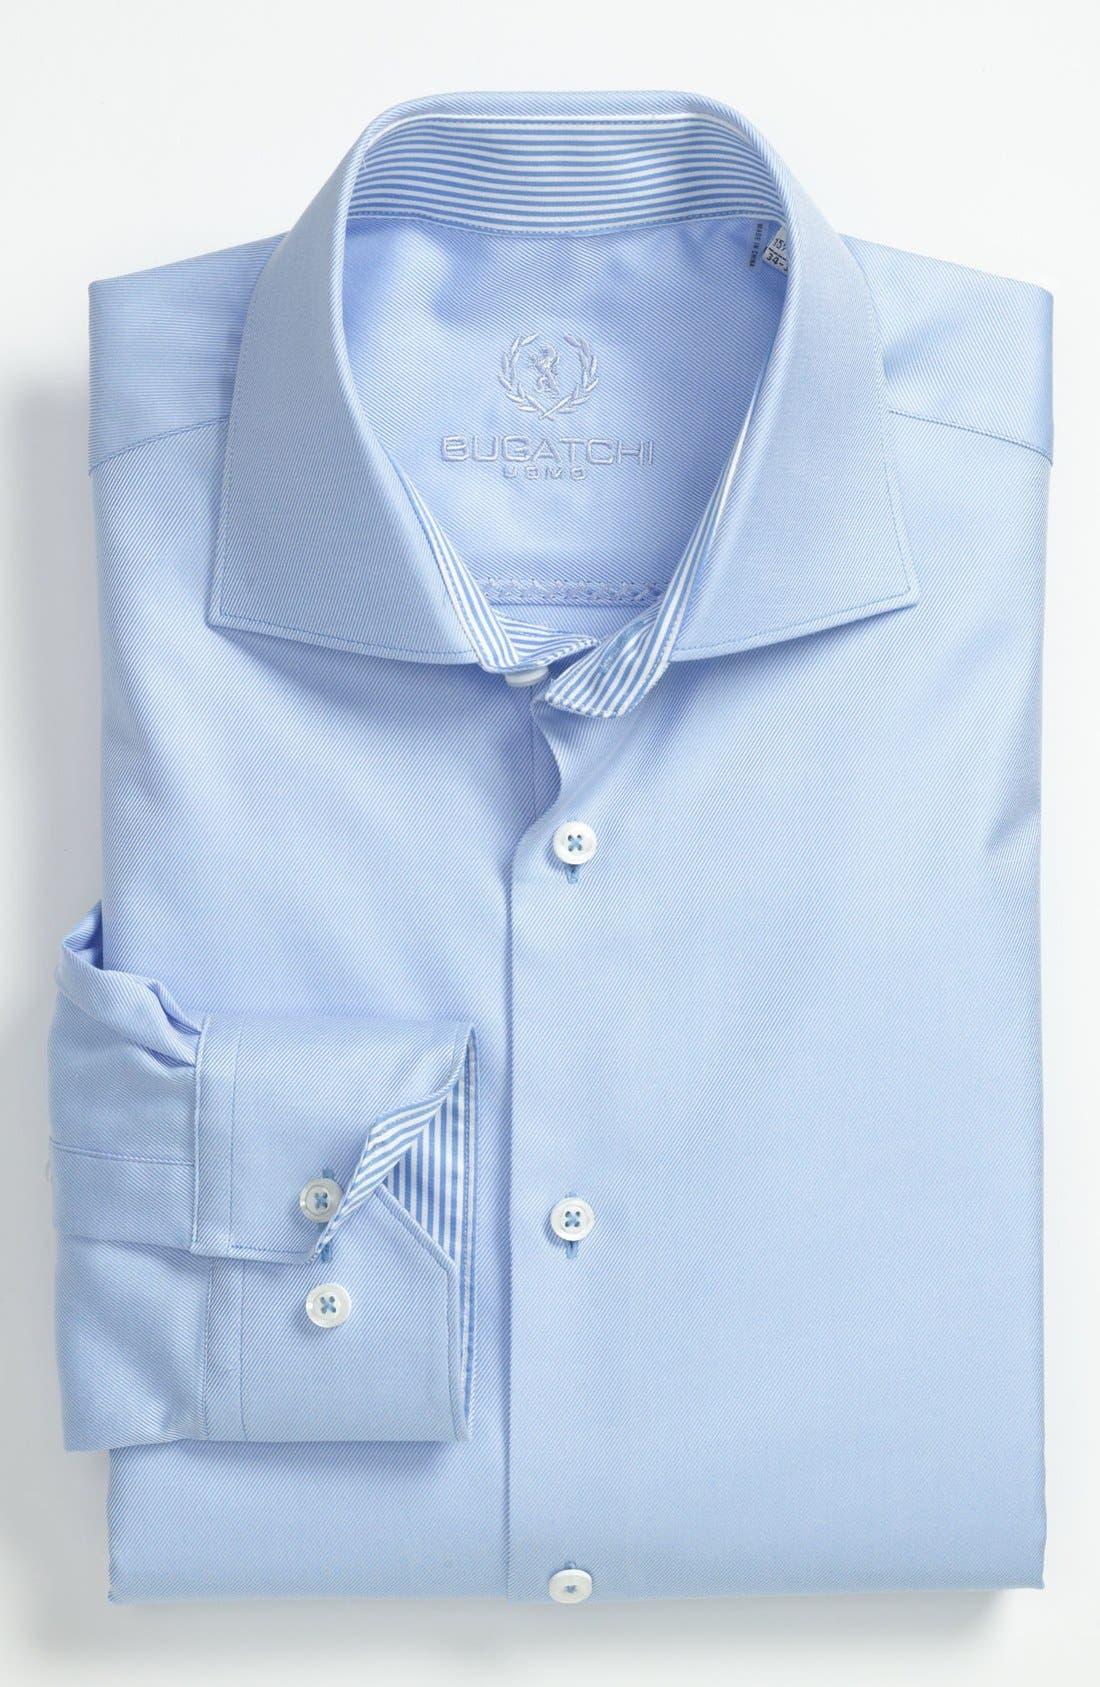 Main Image - Bugatchi Trim Fit Dress Shirt